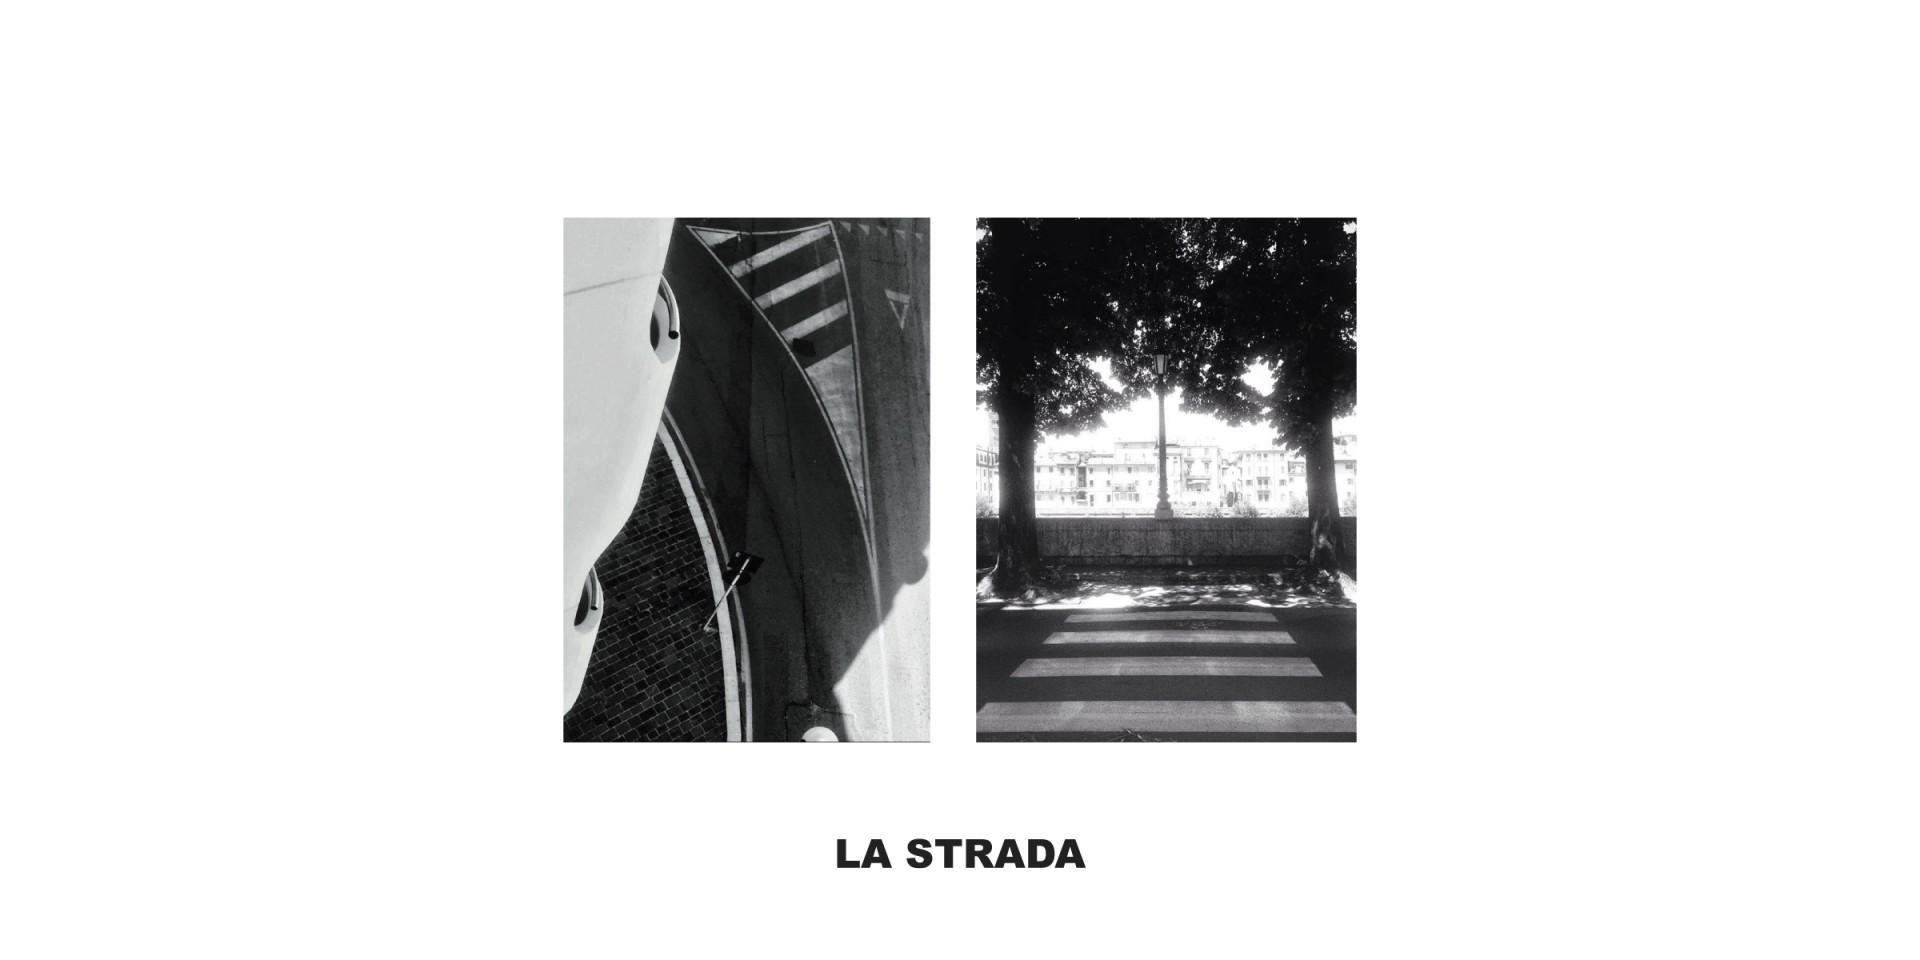 01-slide-la-strada-5.jpg